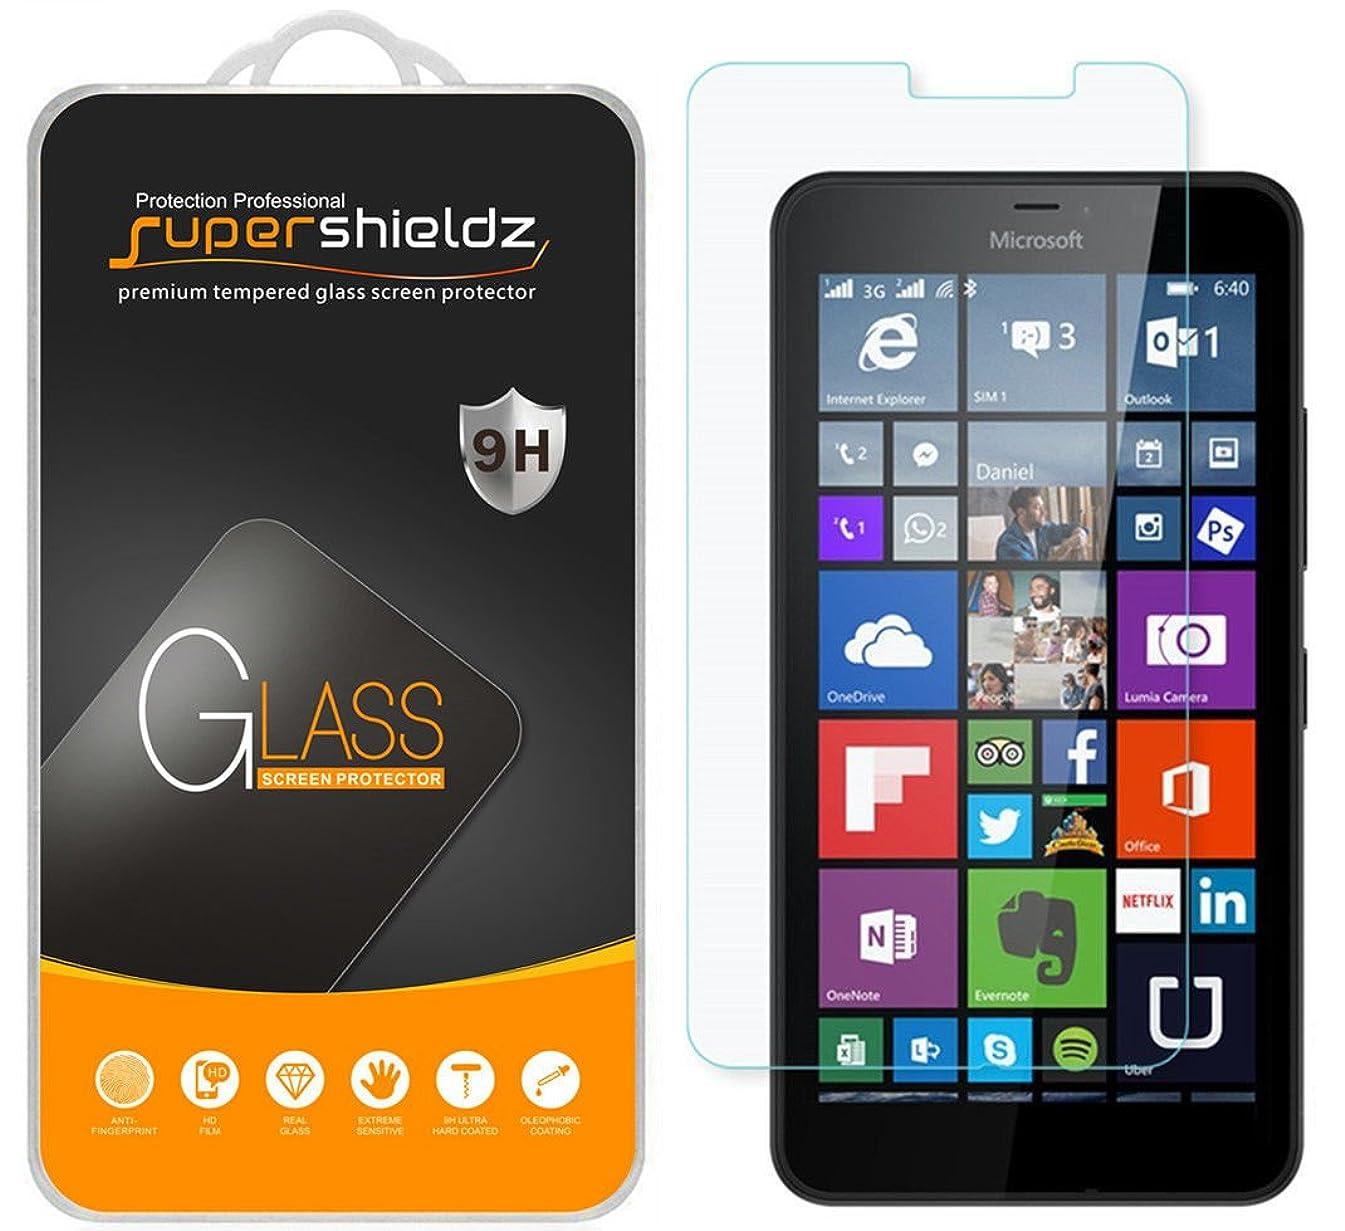 Supershieldz for Microsoft Lumia 640 XL Tempered Glass Screen Protector, Anti-Scratch, Anti-Fingerprint, Bubble Free, Lifetime Replacement